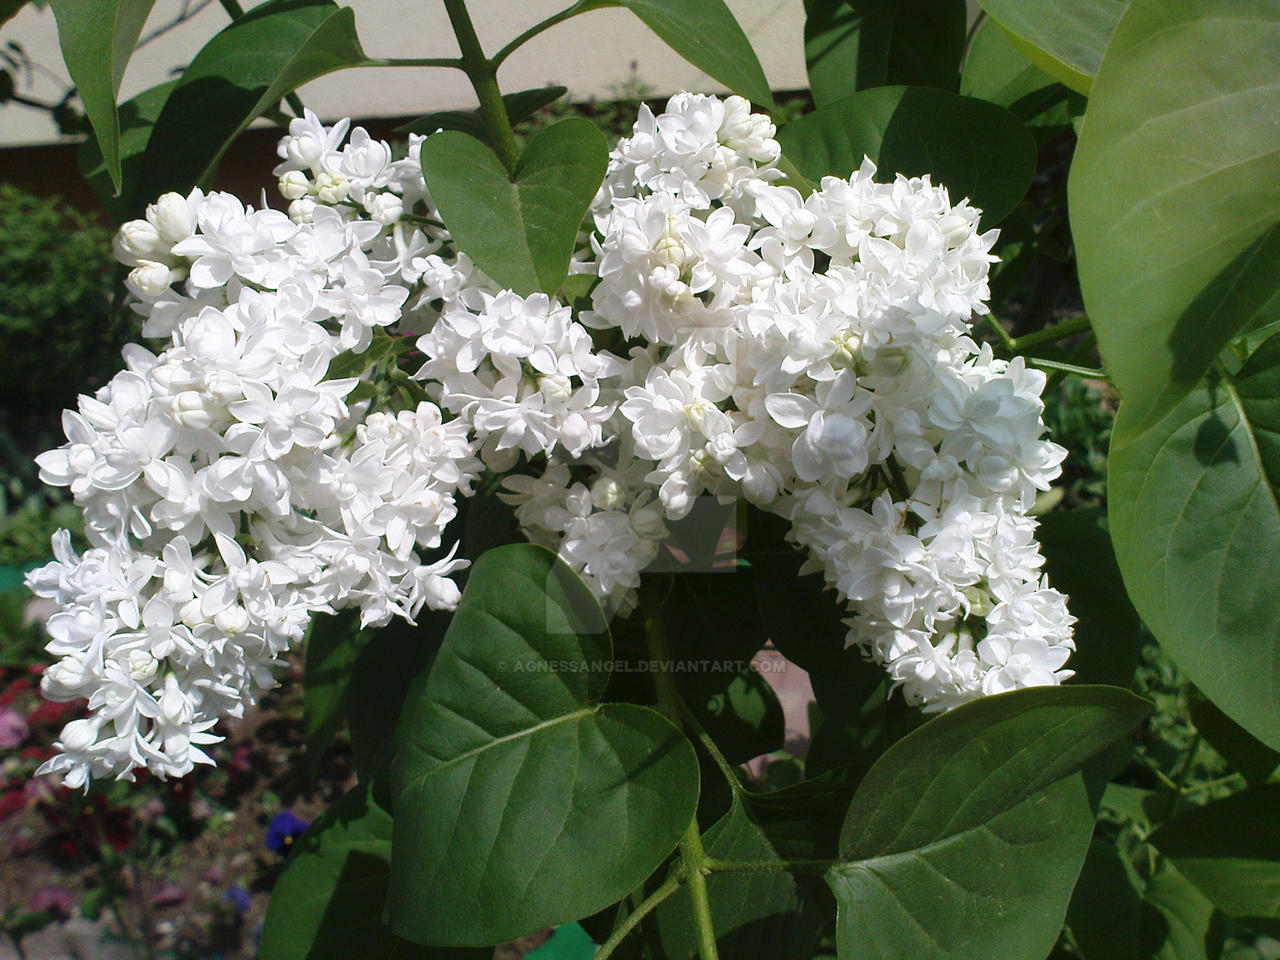 Lilac syringa vulgaris by agnessangel on deviantart - Syringa vulgaris ...